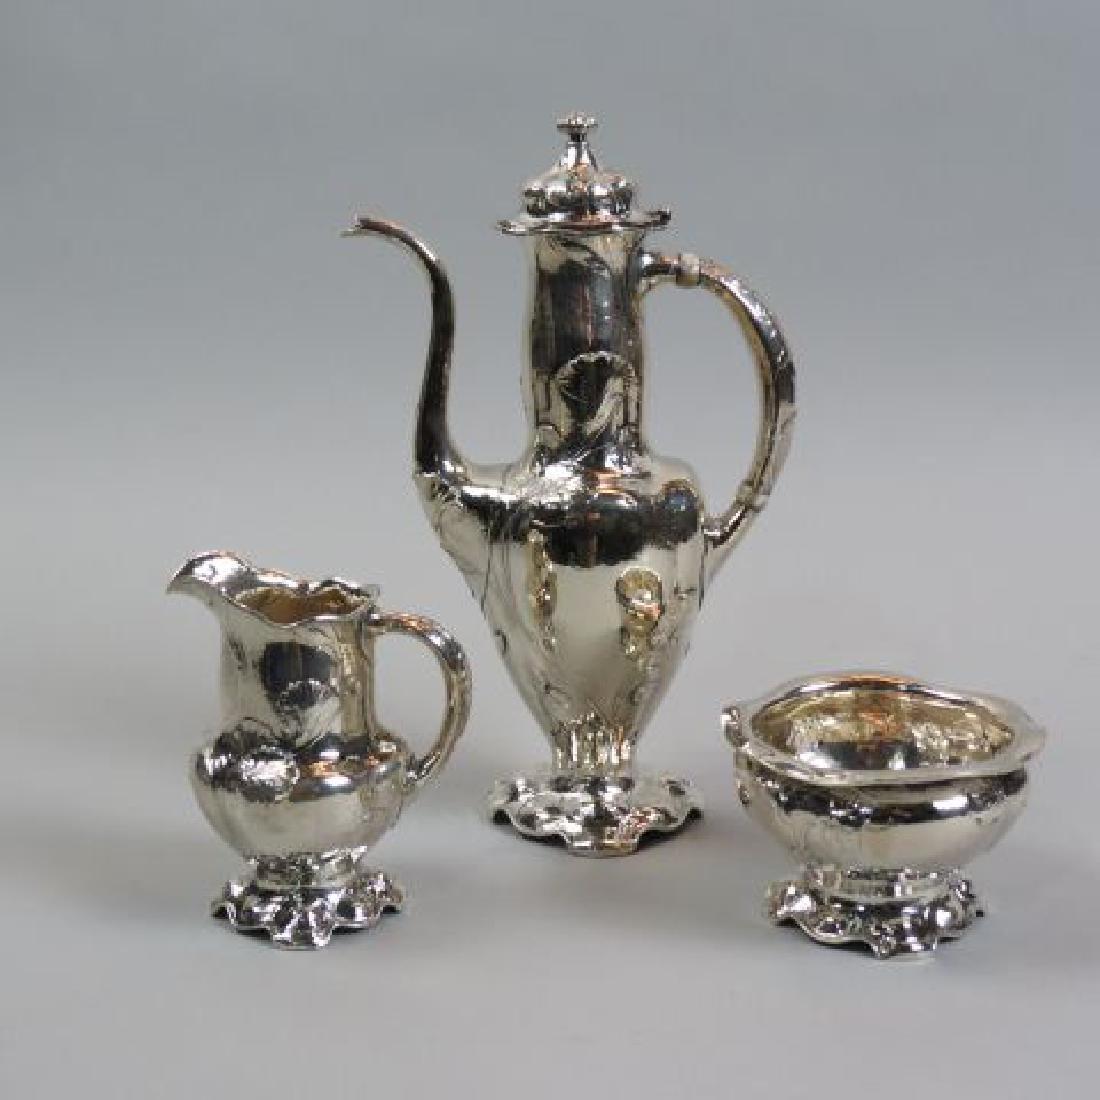 Rare Gorham Martele Sterling Coffee Set,